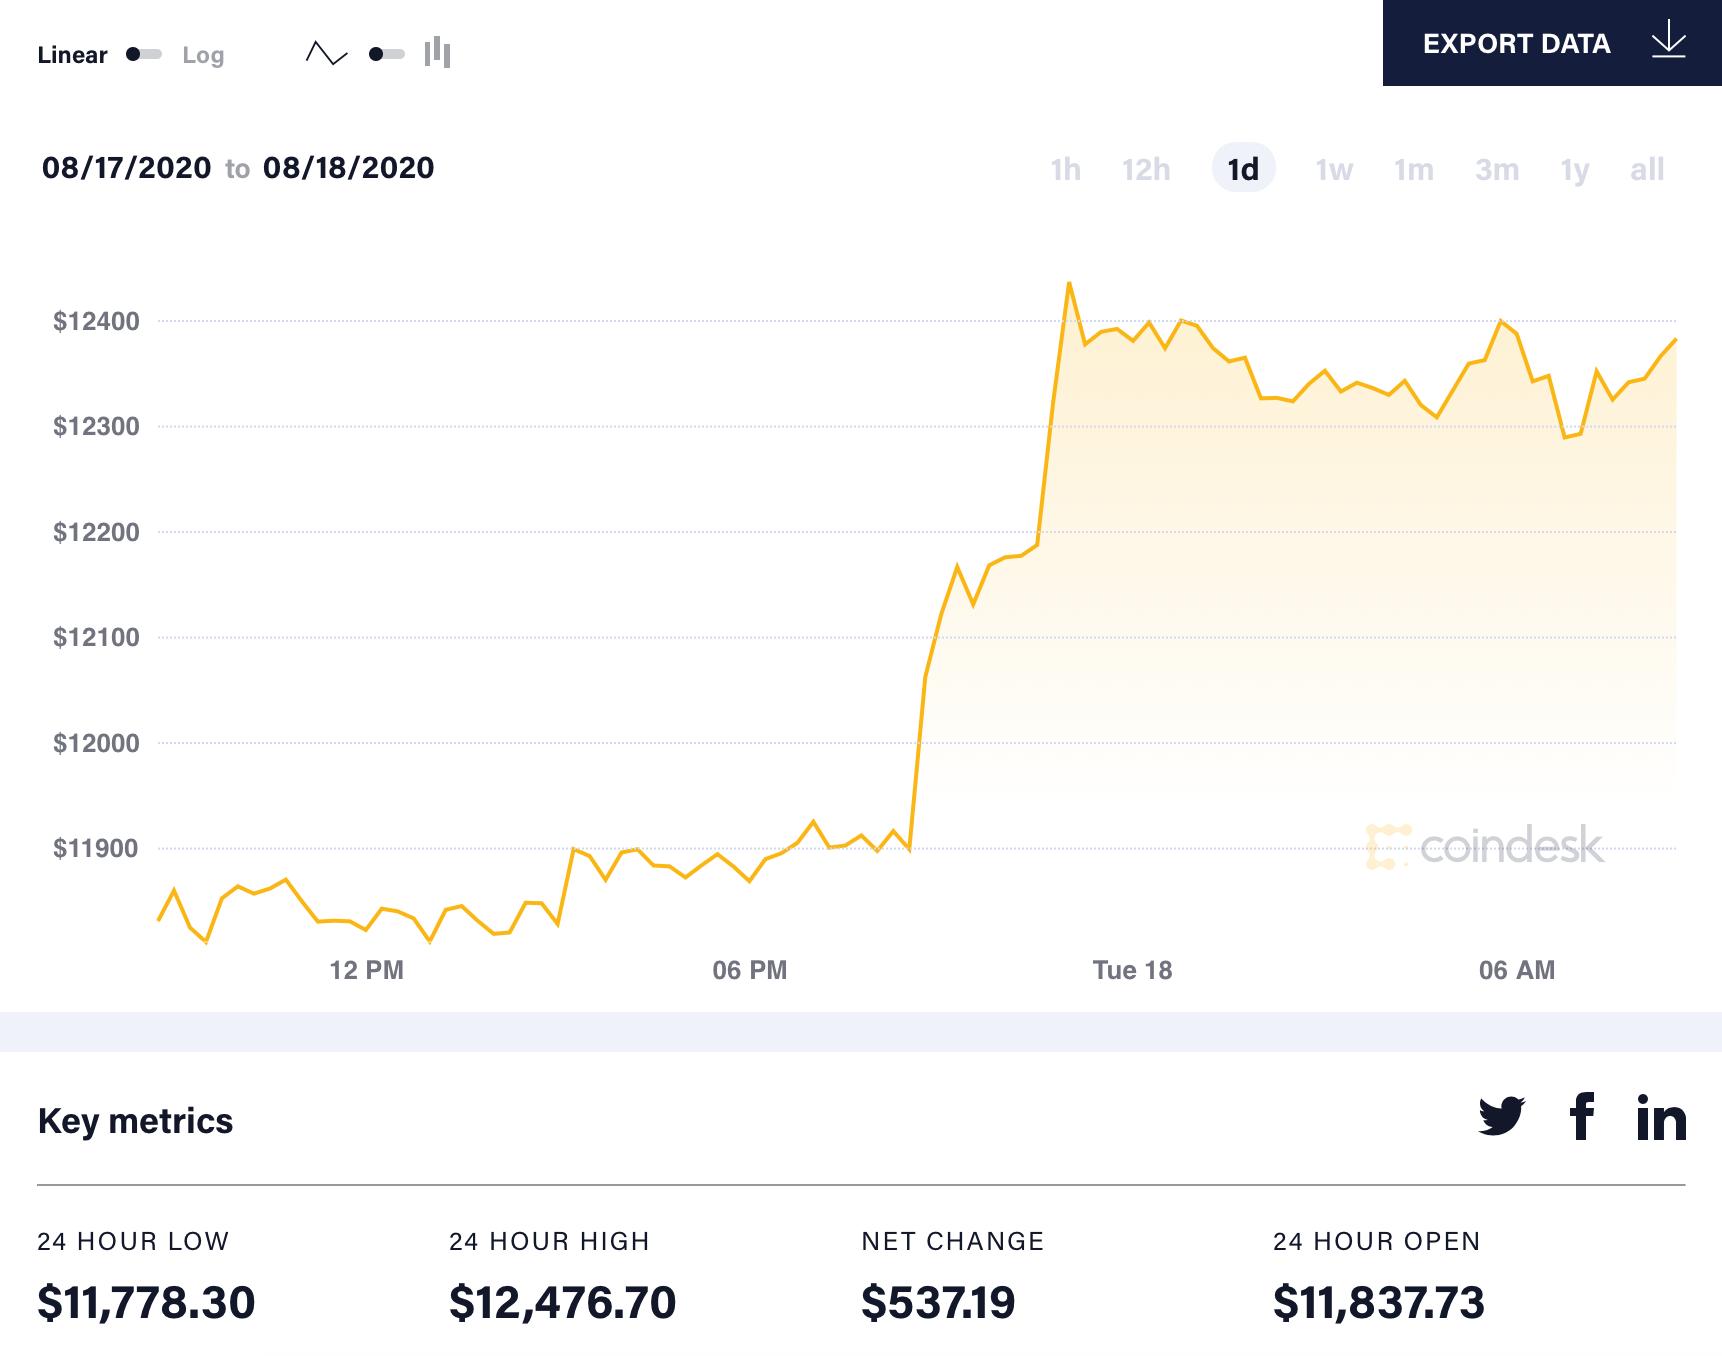 diễn biến giá bitcoin 24h